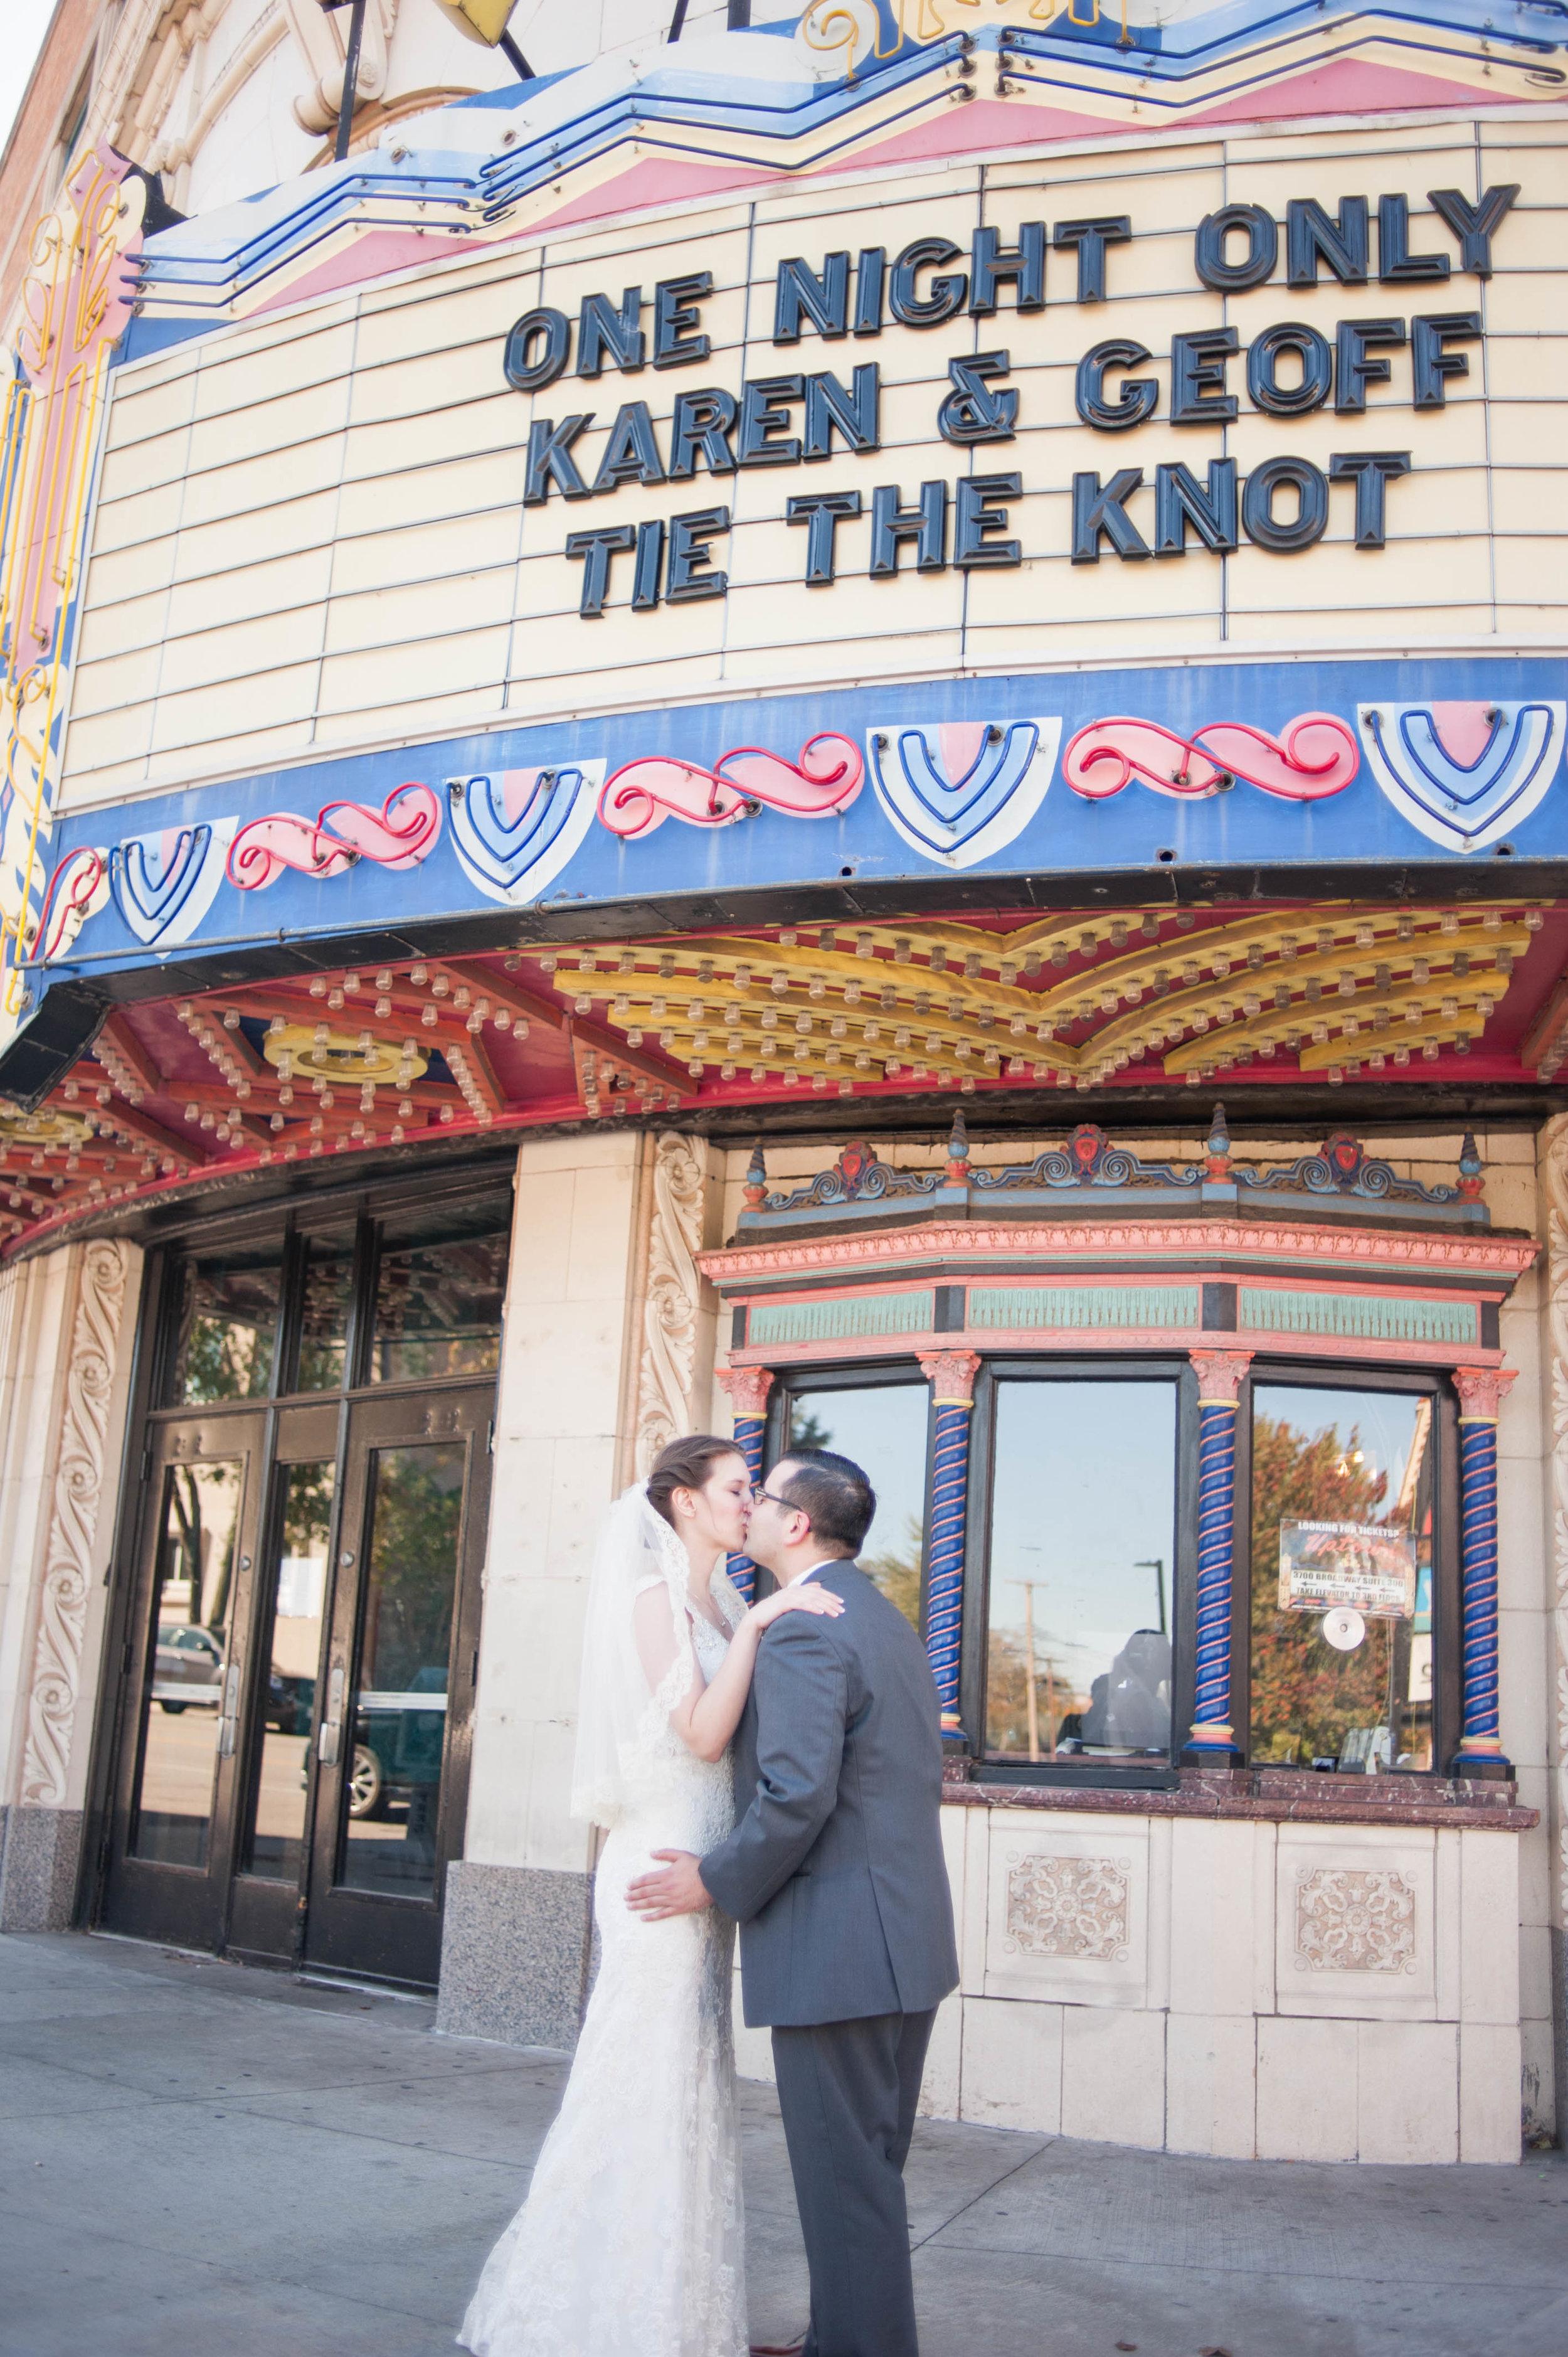 Uptown Theater - Kansas City Wedding Venues